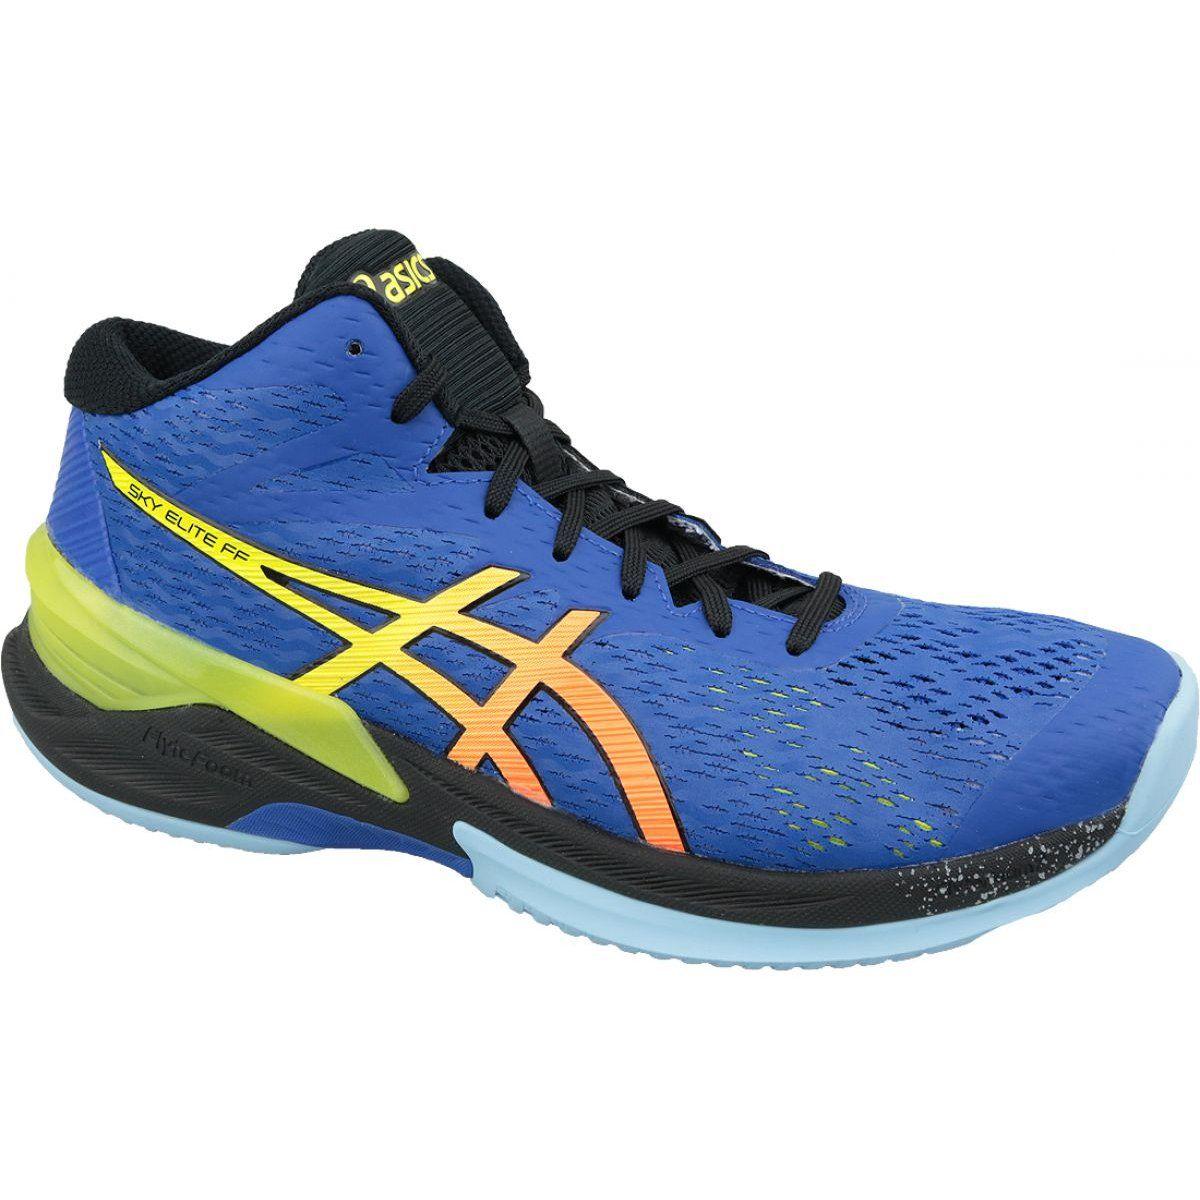 Buty Do Siatkowki Asics Sky Elite Ff Mt M 1051a032 400 Niebieskie Niebieskie Volleyball Shoes Mens Volleyball Shoes Blue Shoes